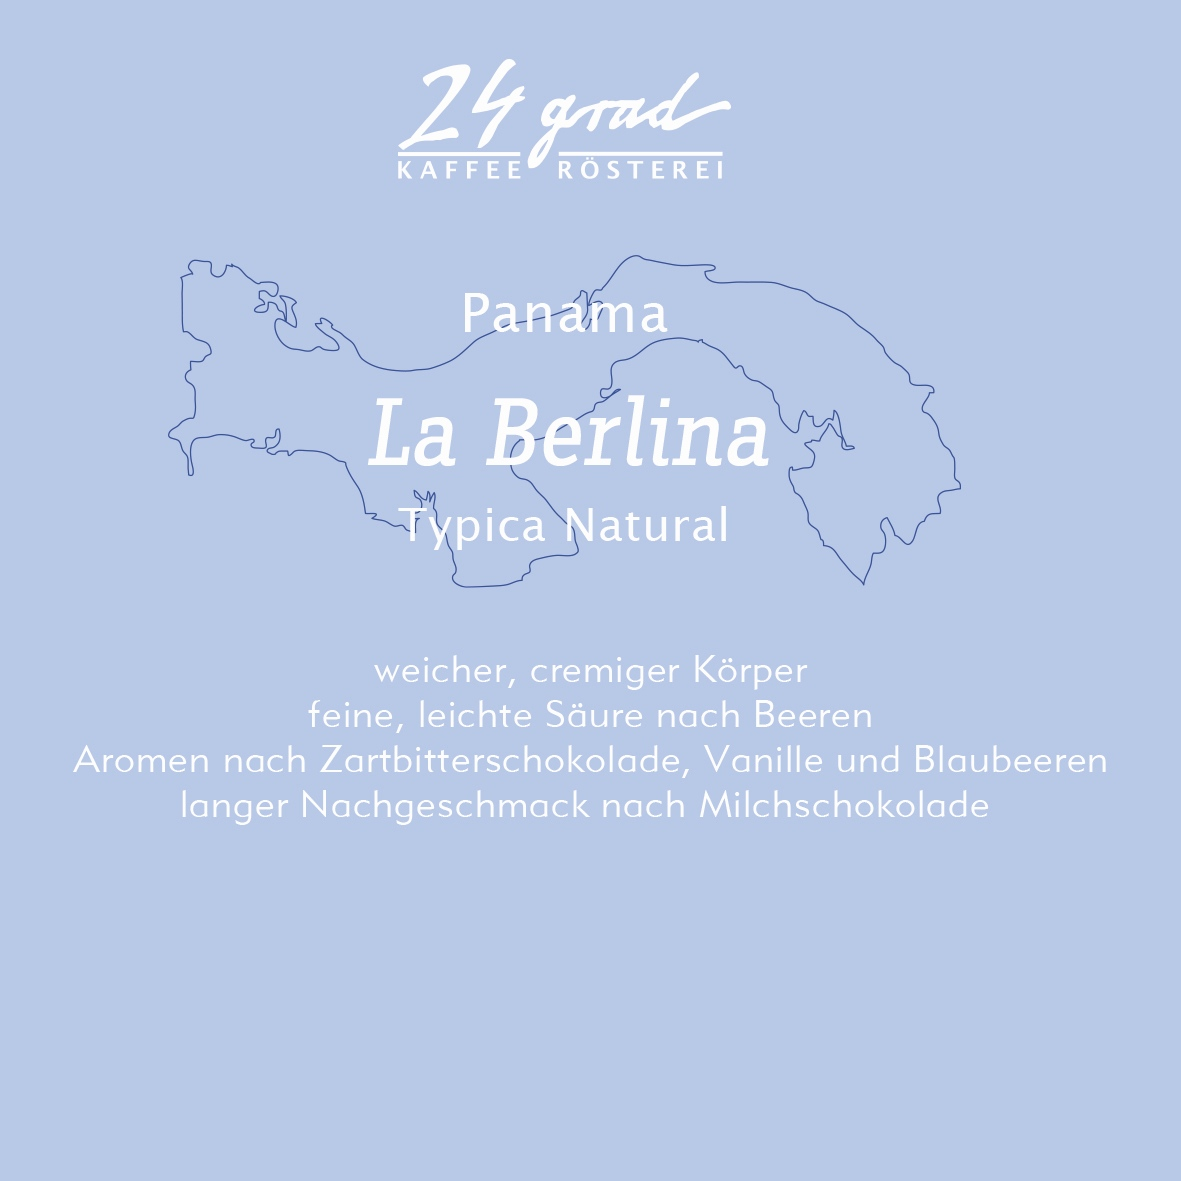 Panama La Berlina Typica Natural